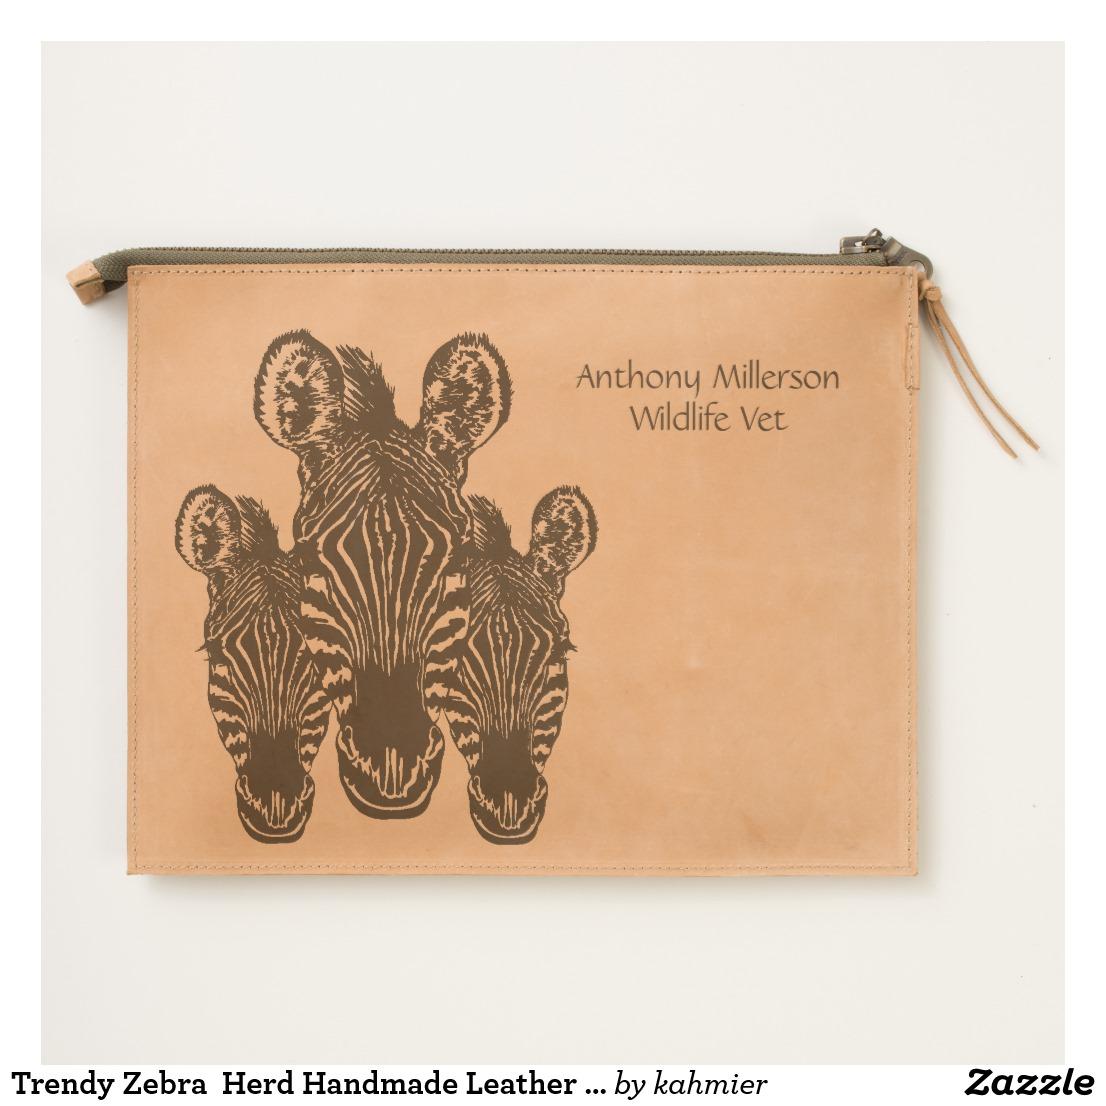 Trendy Zebra Herd Handmade Leather Personal Travel Pouch